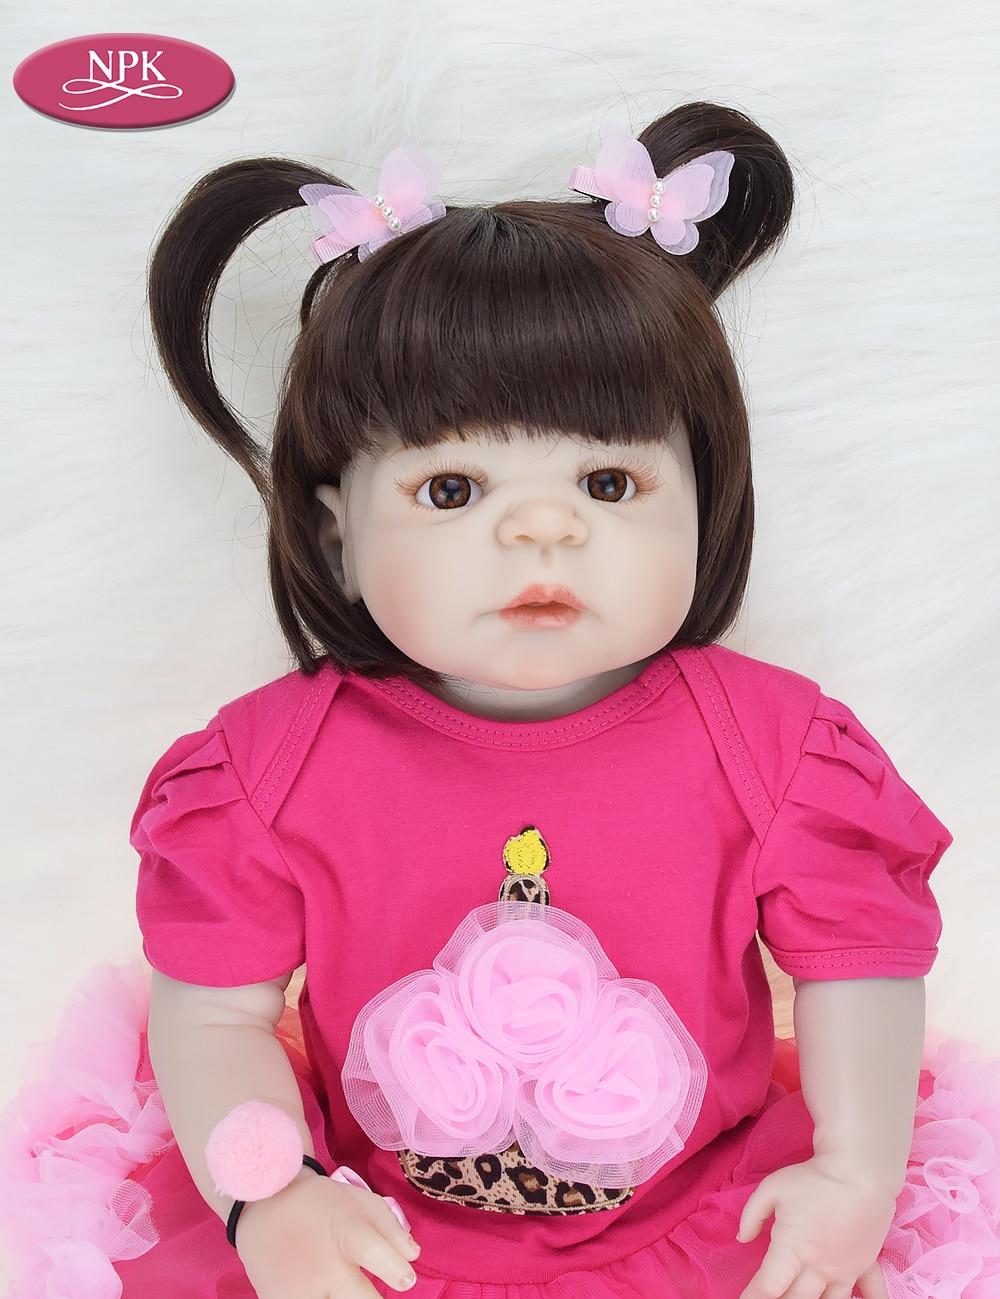 NPK 57CM Full Body Soft Silicone Girls Reborn Baby Doll Bathe Toys Lifelike Princess Girl Dolls Bebe Real Reborn Boneca Menina  (12)